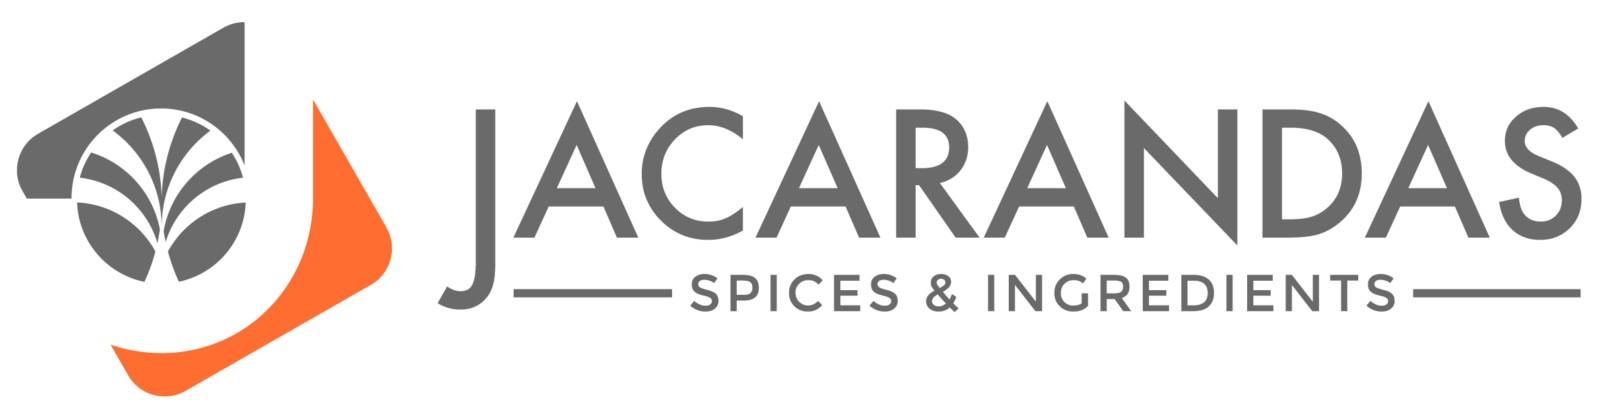 logo-jacarandas-participant-2018